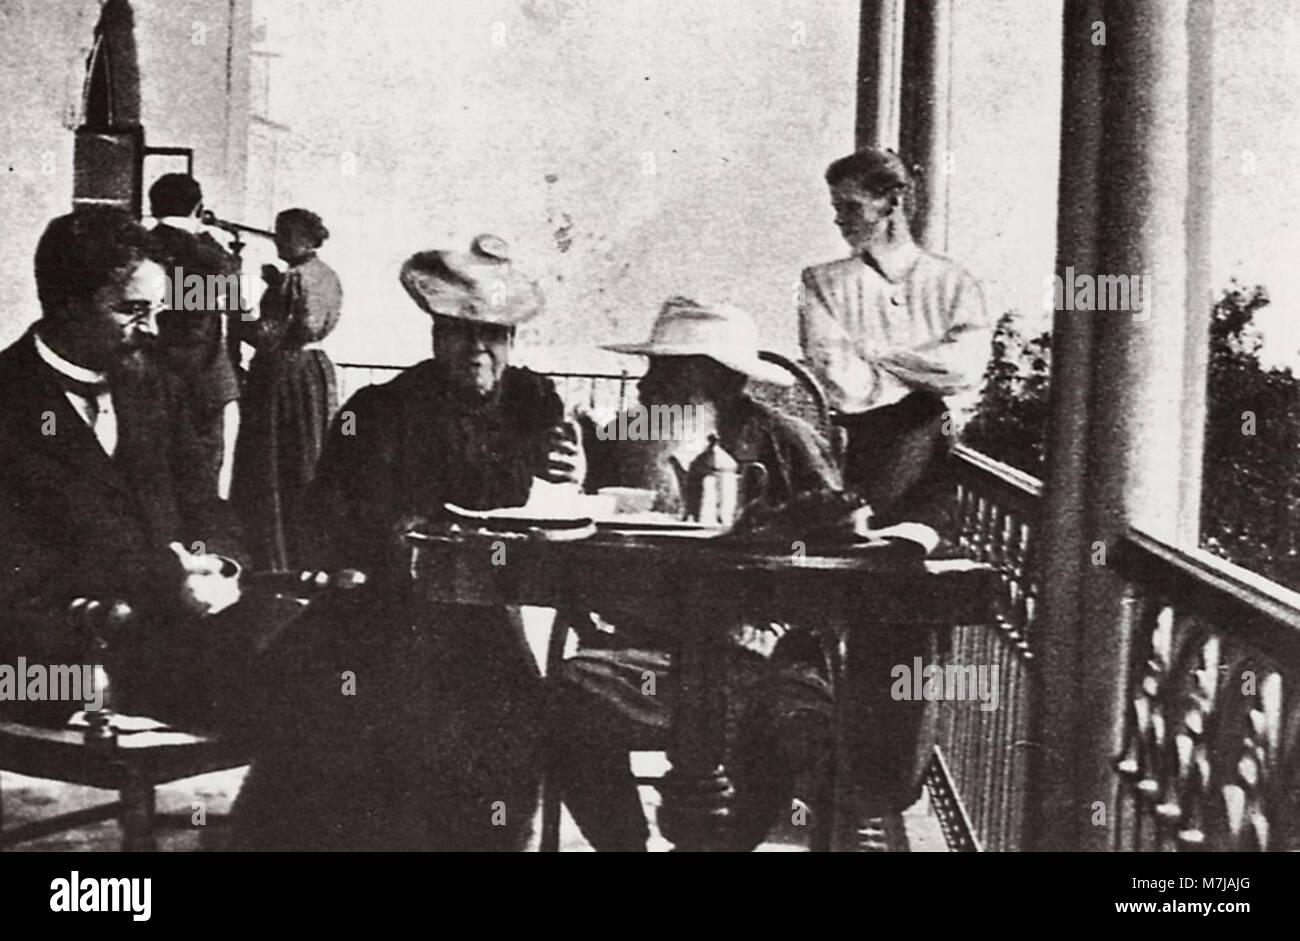 Sergenko, Petr Alekseevič - Tolstoj und Čechov-Dača von panina (1) Zeno Fotografie) Stockfoto